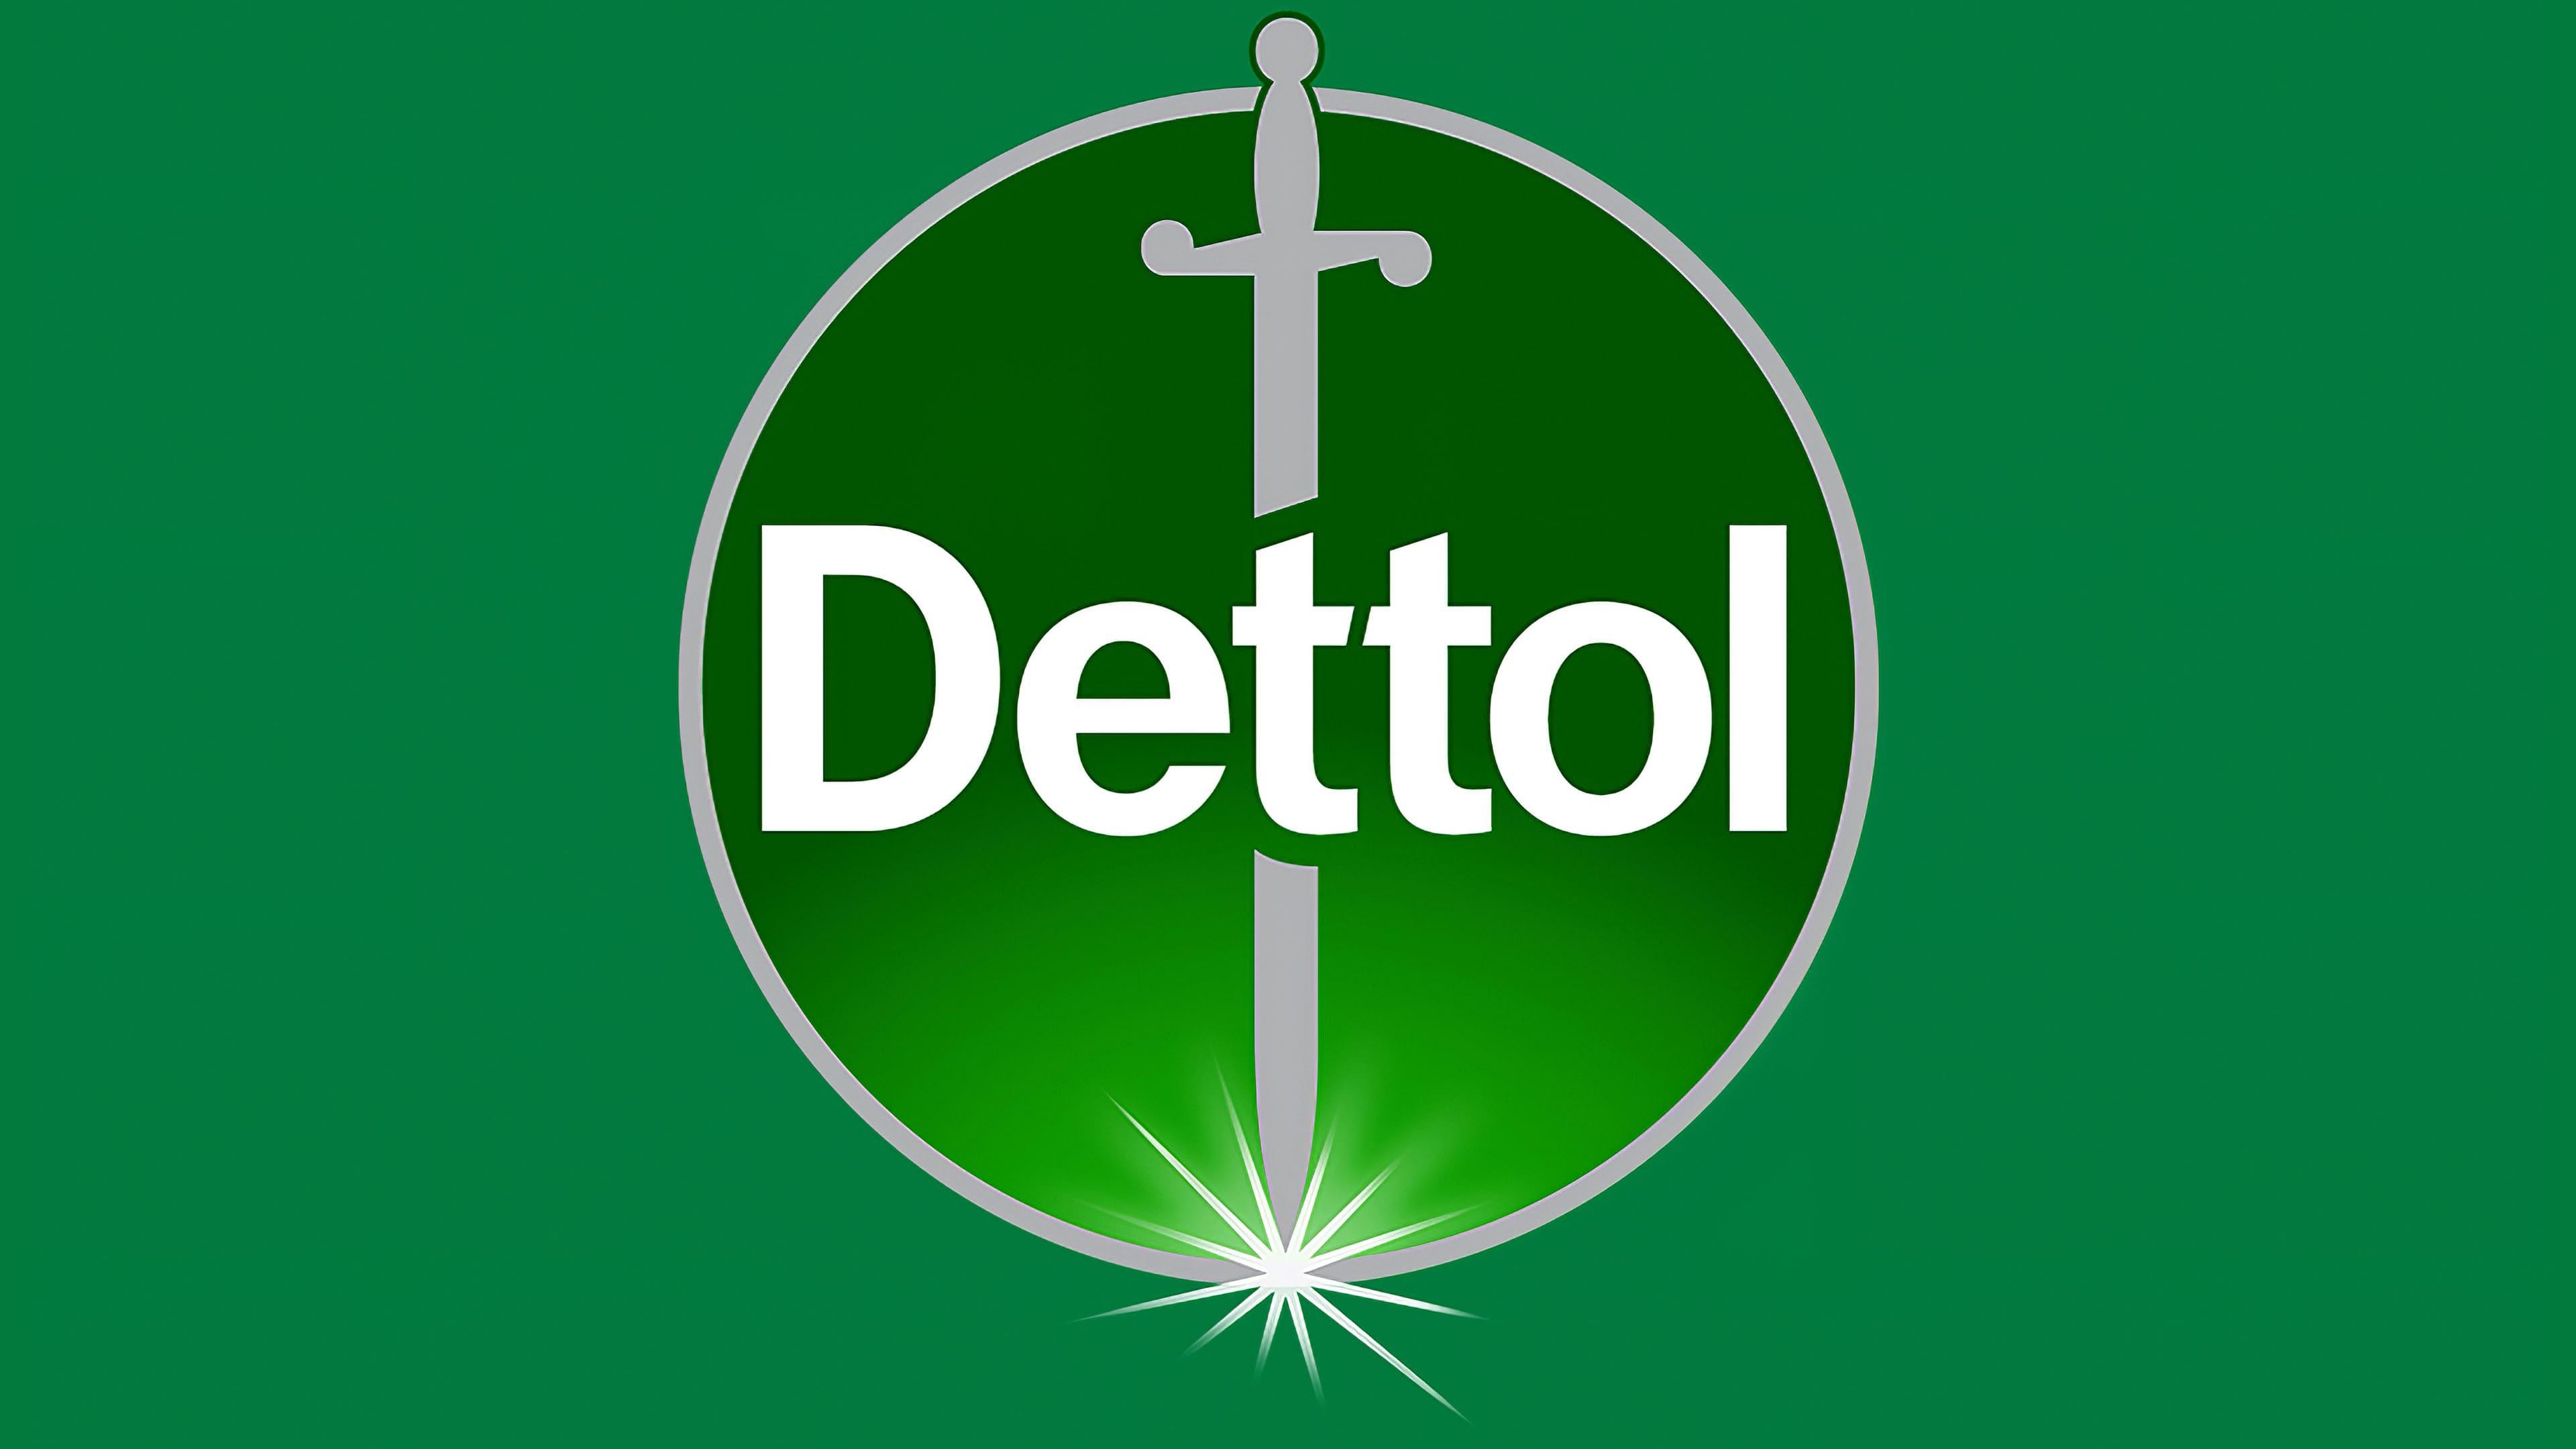 Dettol-Symbol